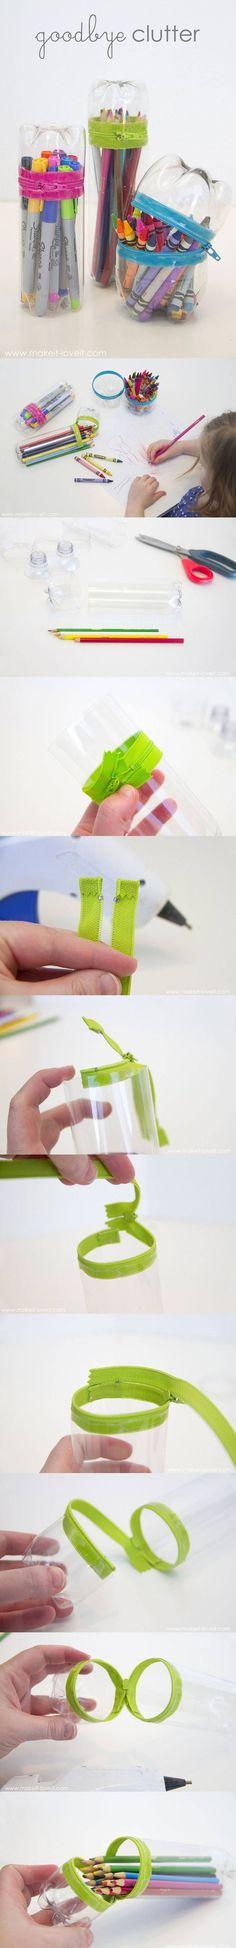 No-Sew Zipper Cases From Plastic Bottles - makeit-loveit.com - Estuches reciclando botellas plástico